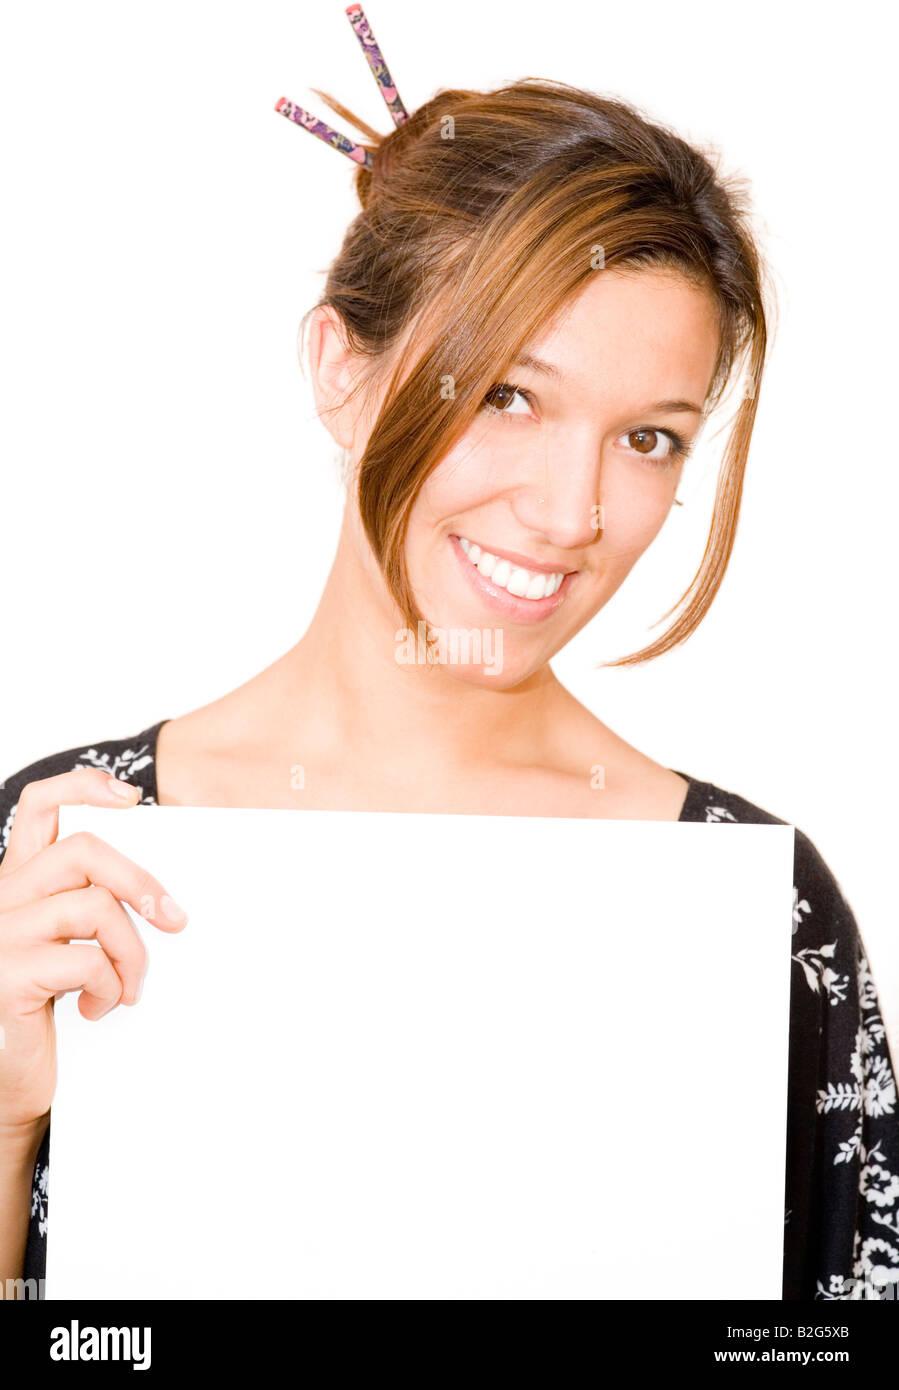 woman paper chic fancy stylish trendy fashion model voguish Stock Photo